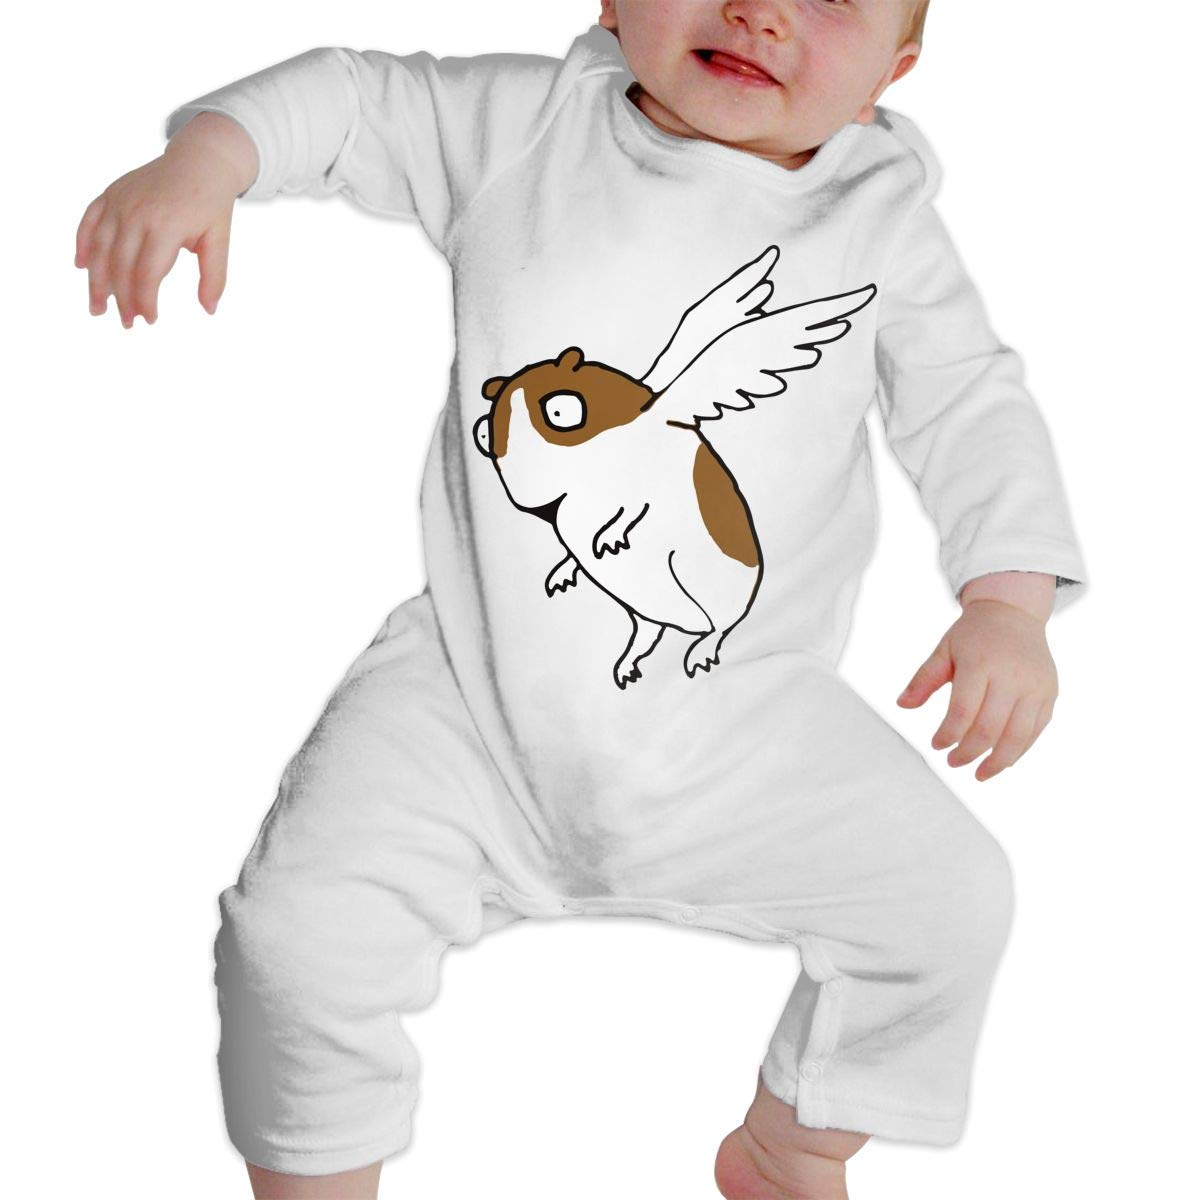 Toddler Romper; Kid/'s Romper; Baby One Piece; Bear Creek RomperUnisex 2T